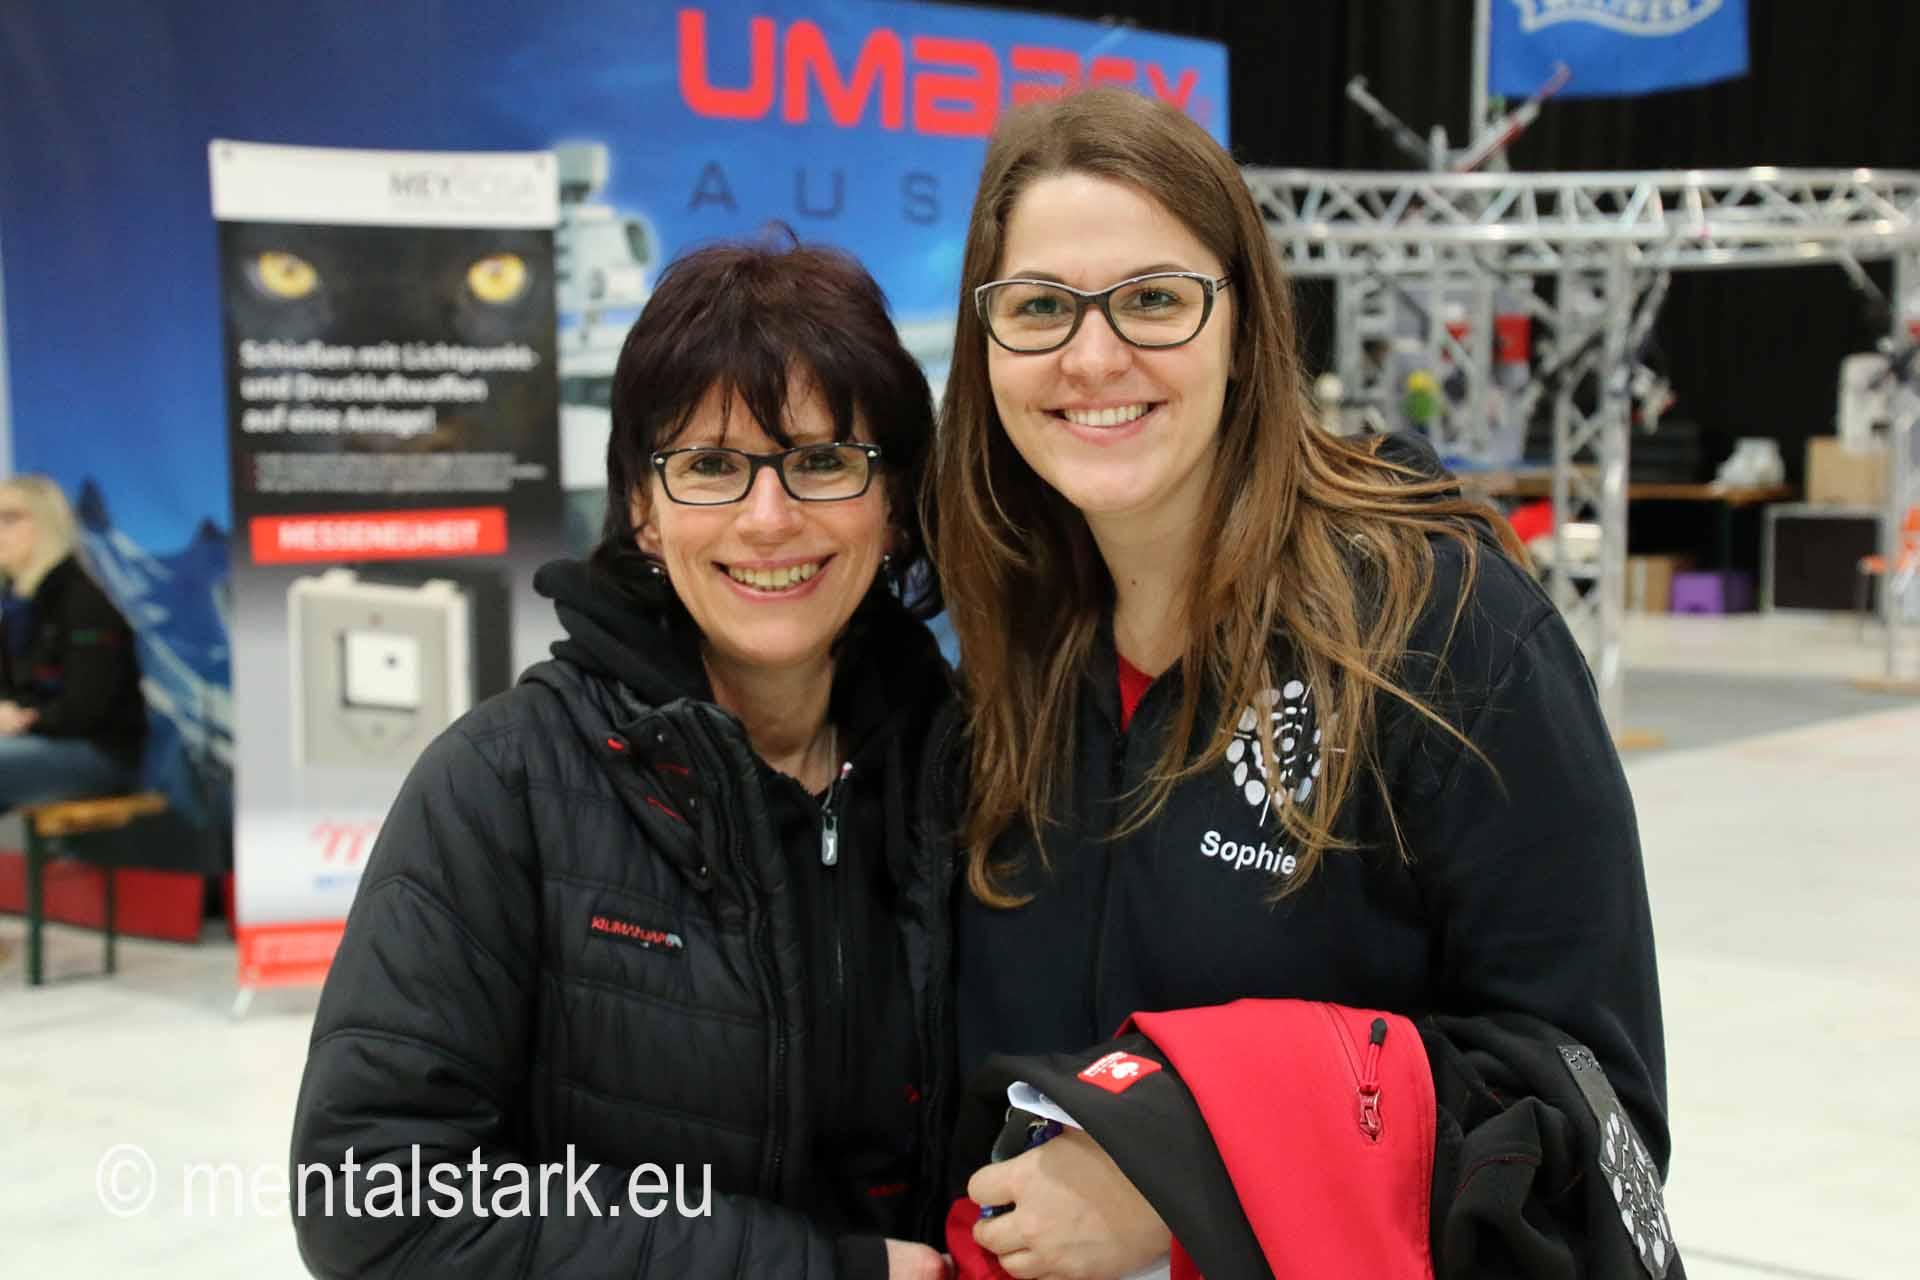 Sabine Stockmann & Sophie Pusterhofer